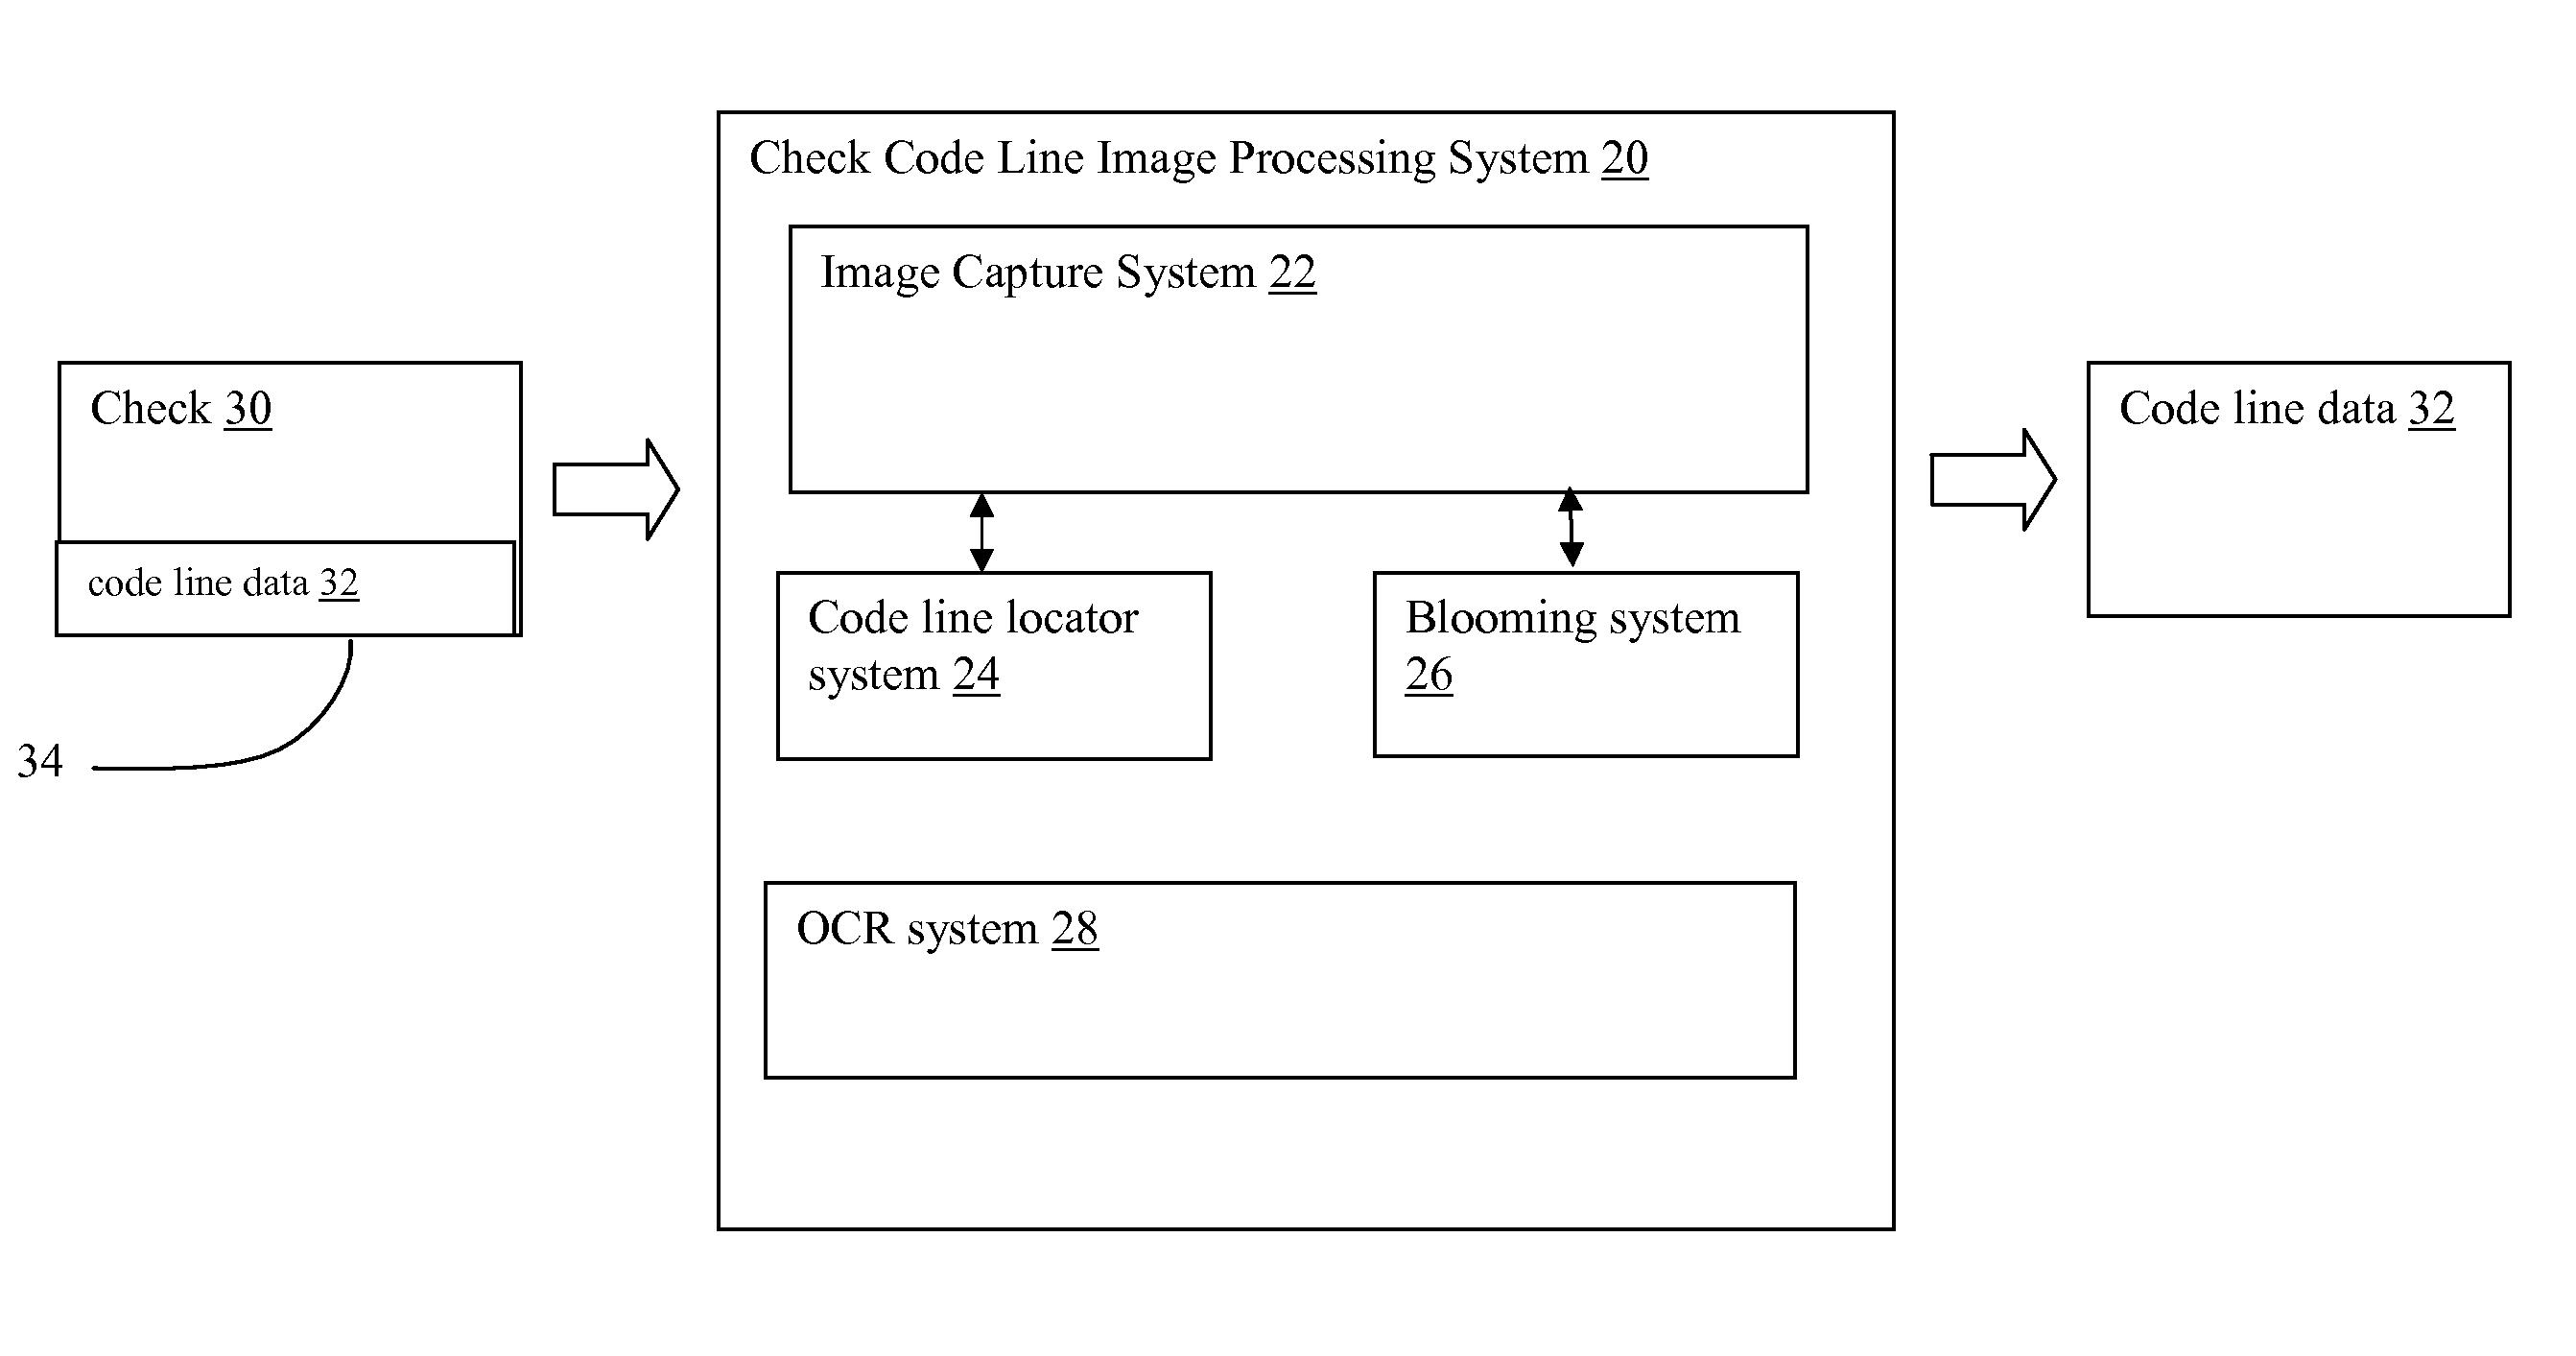 Patent US20070262146 - Enhanced check code line image